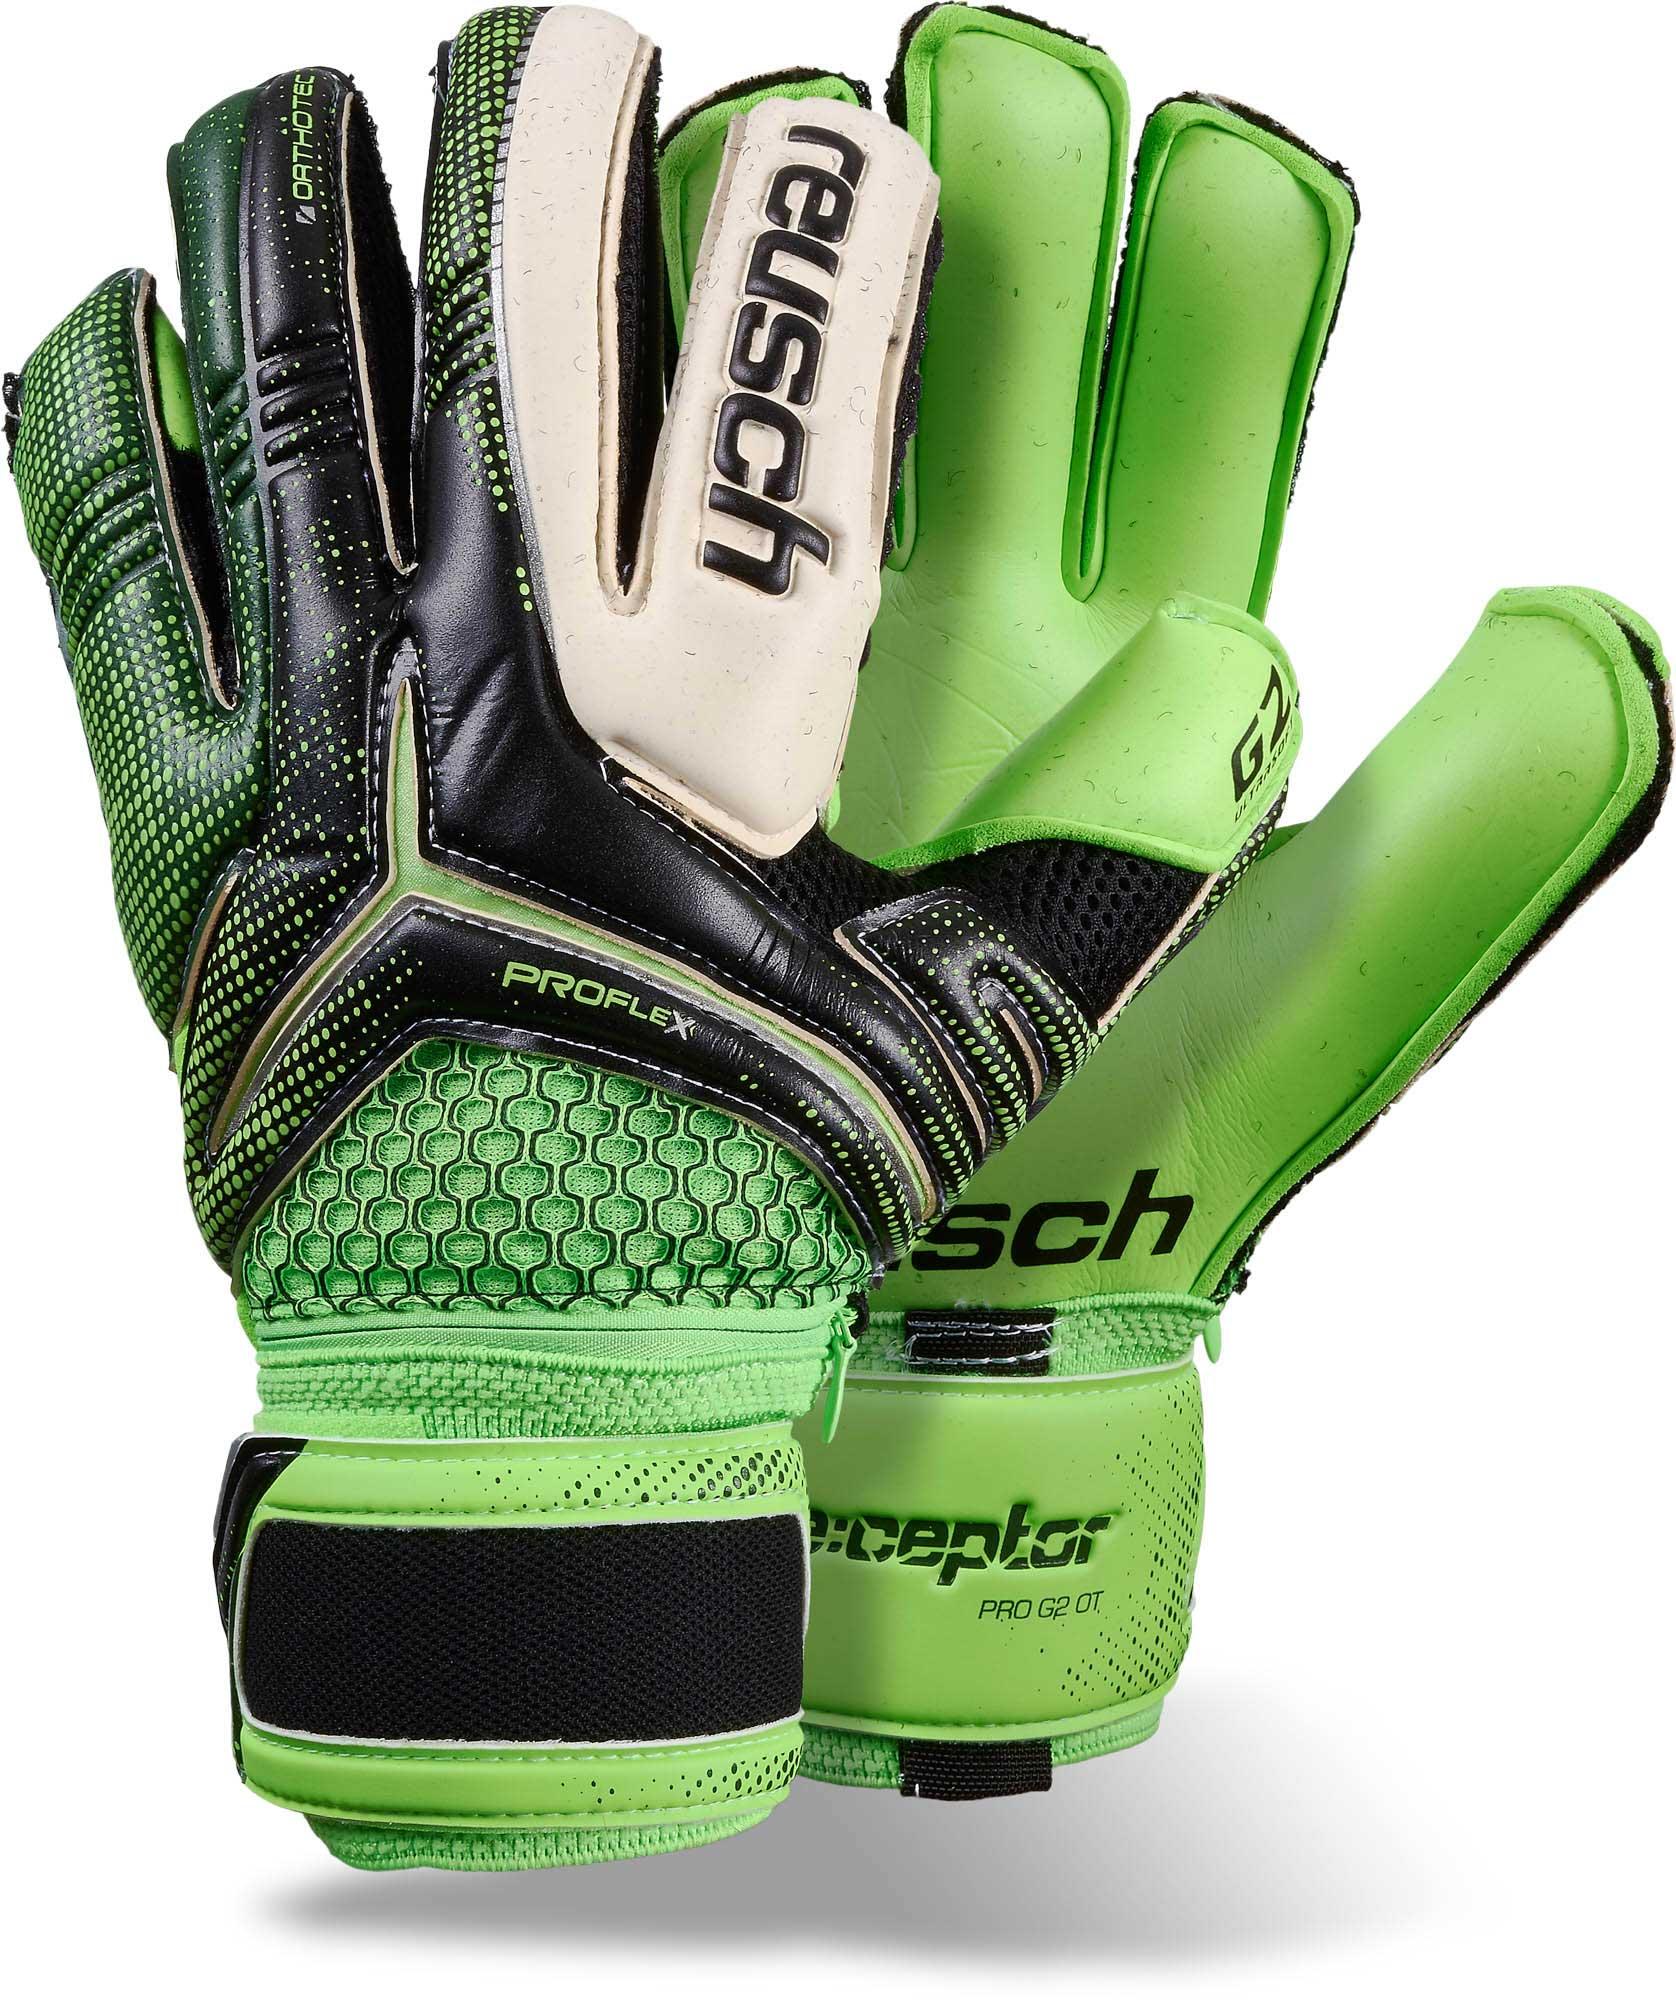 Reusch RE CEPTOR PRO G2 Ortho-Tec Goalkeeper Gloves – Black and Green 2d72c14d6